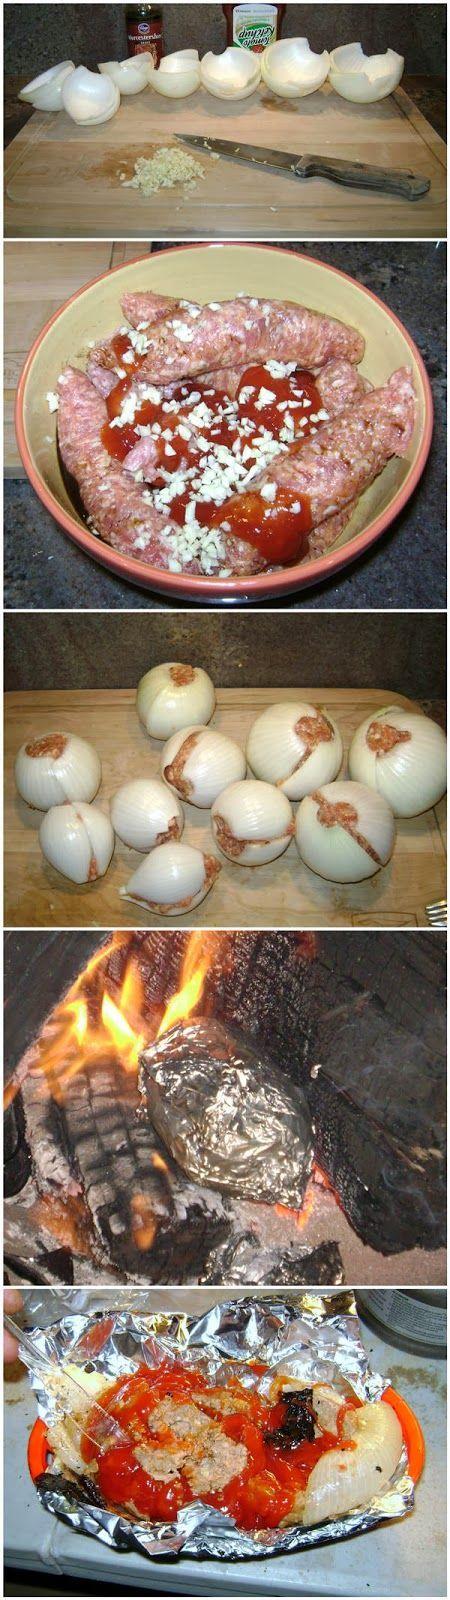 Onion Bombs (Camping Food).